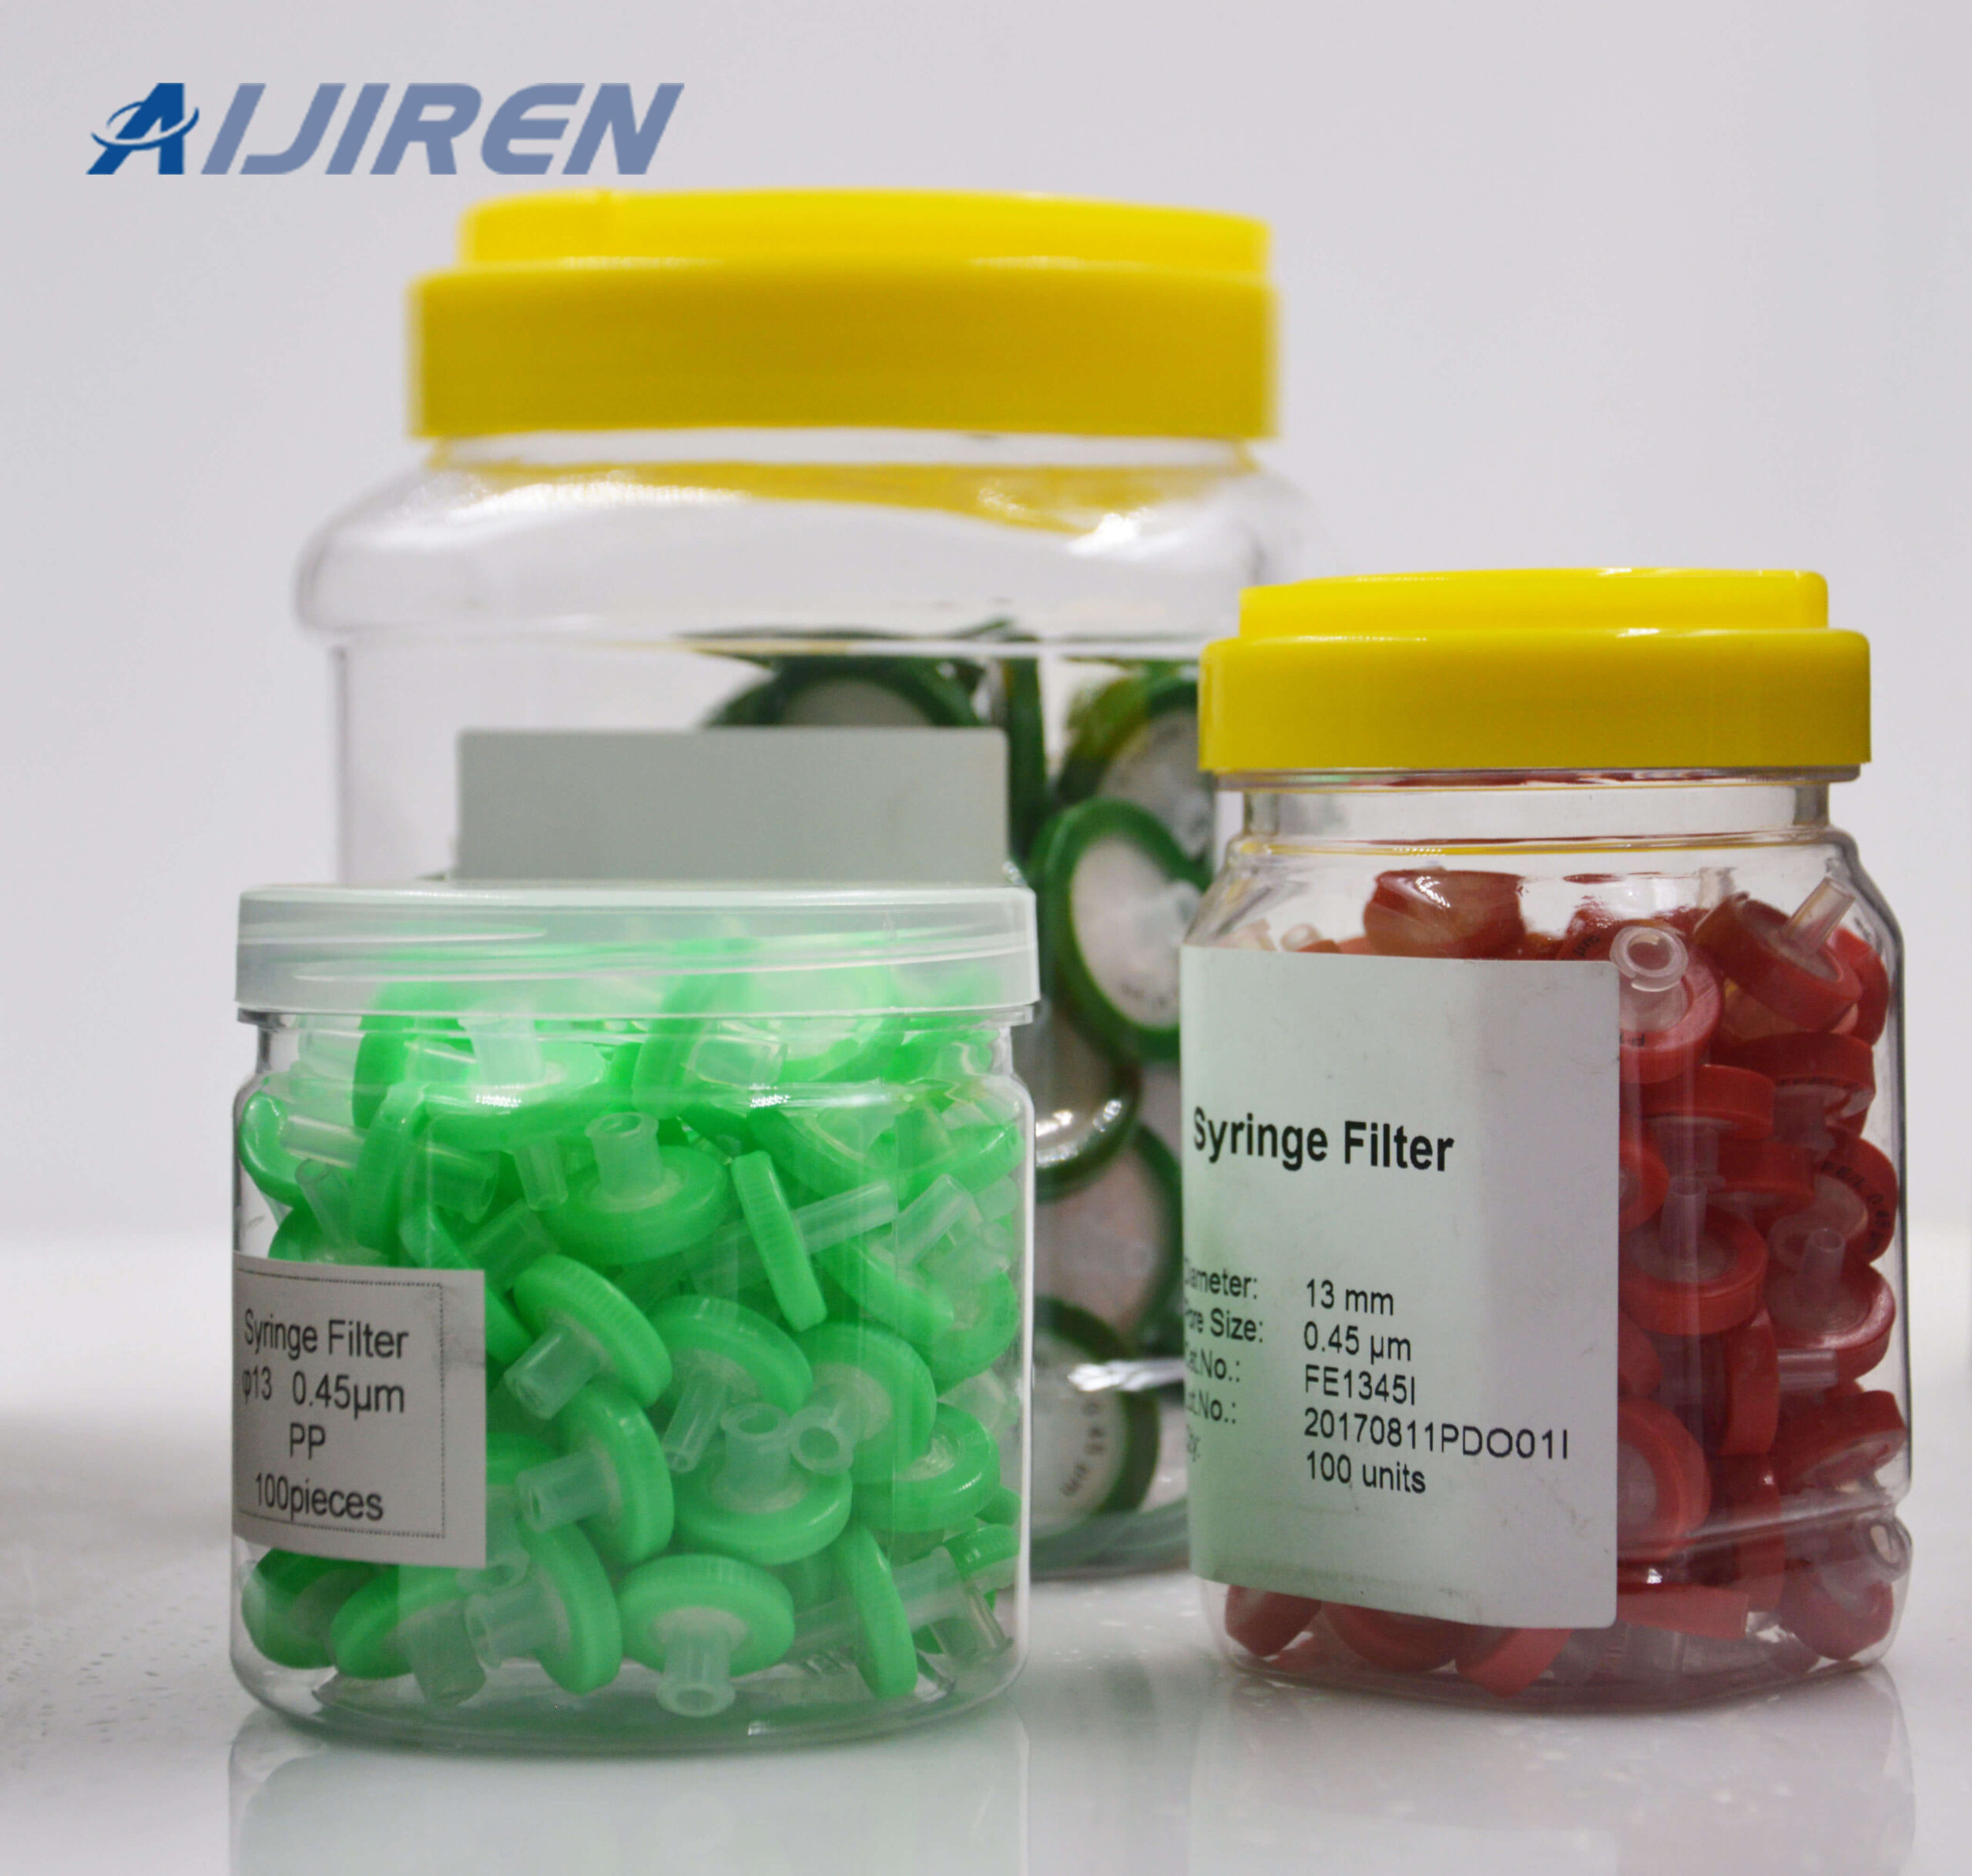 20ml headspace vial13mm 0.45 Syringe Filter